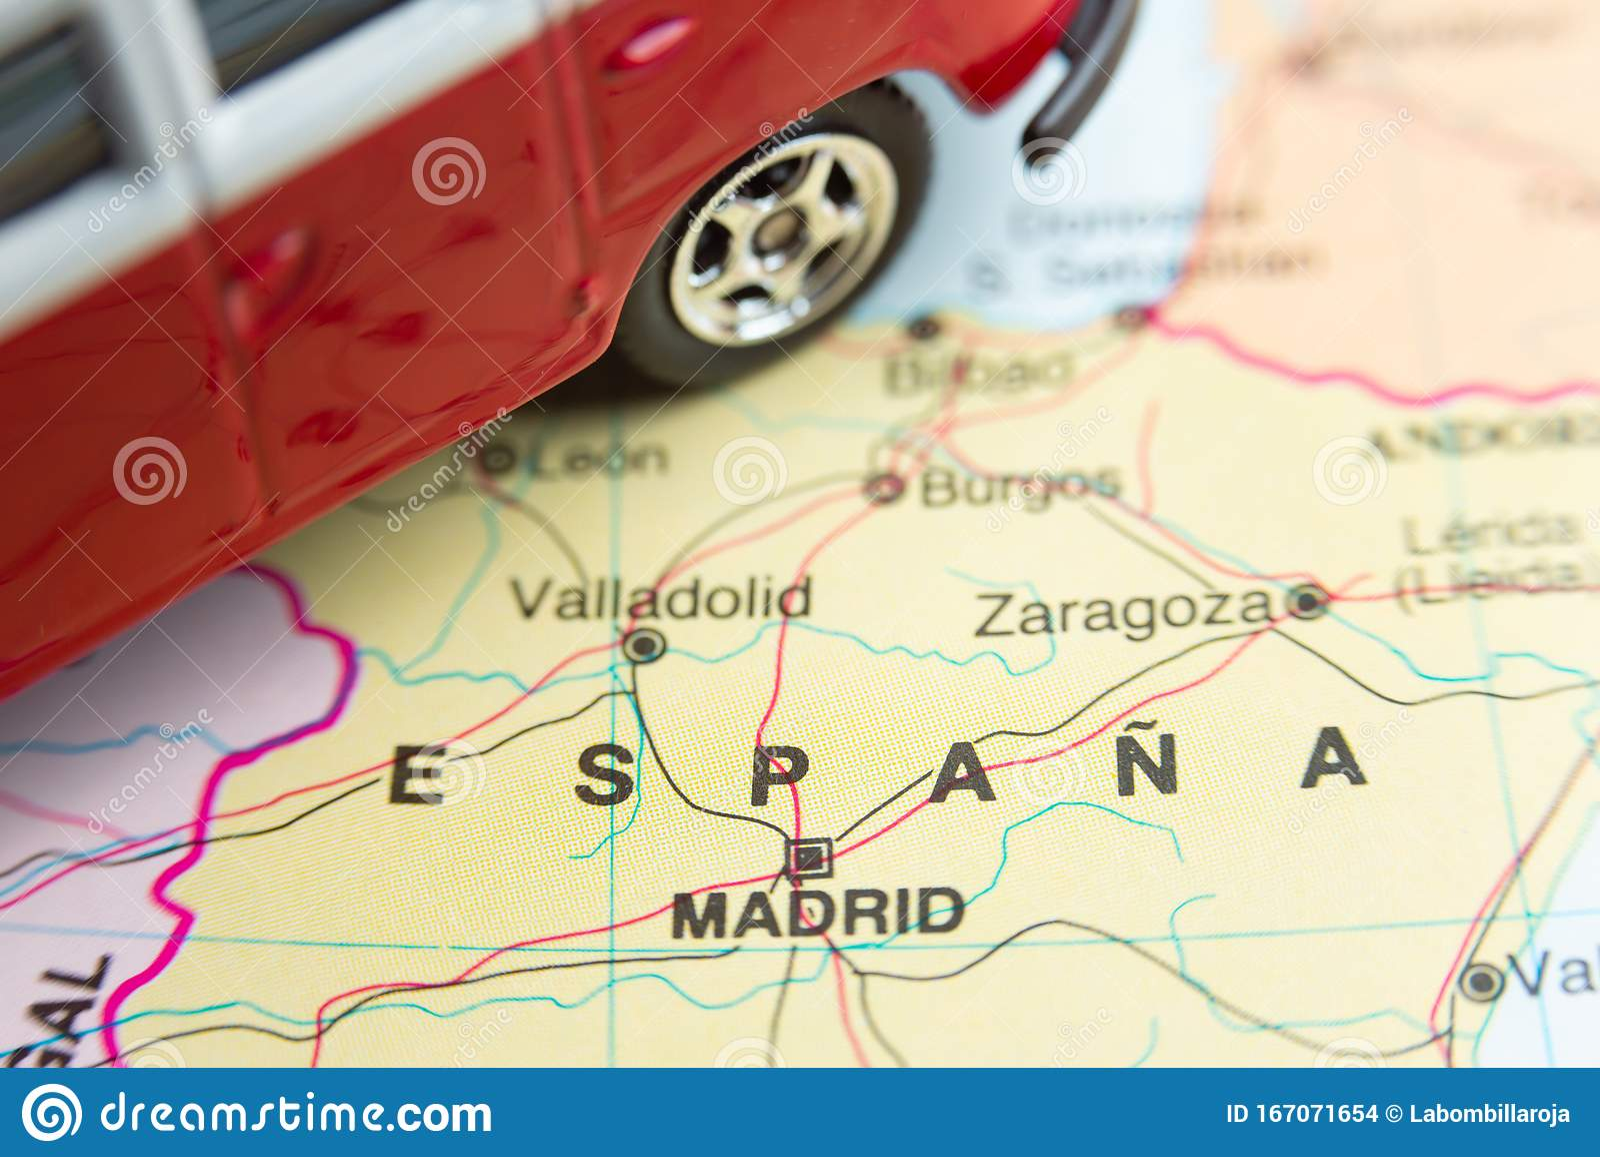 Spain Van Travel Stock Photo Image Of Camper Guide 167071654